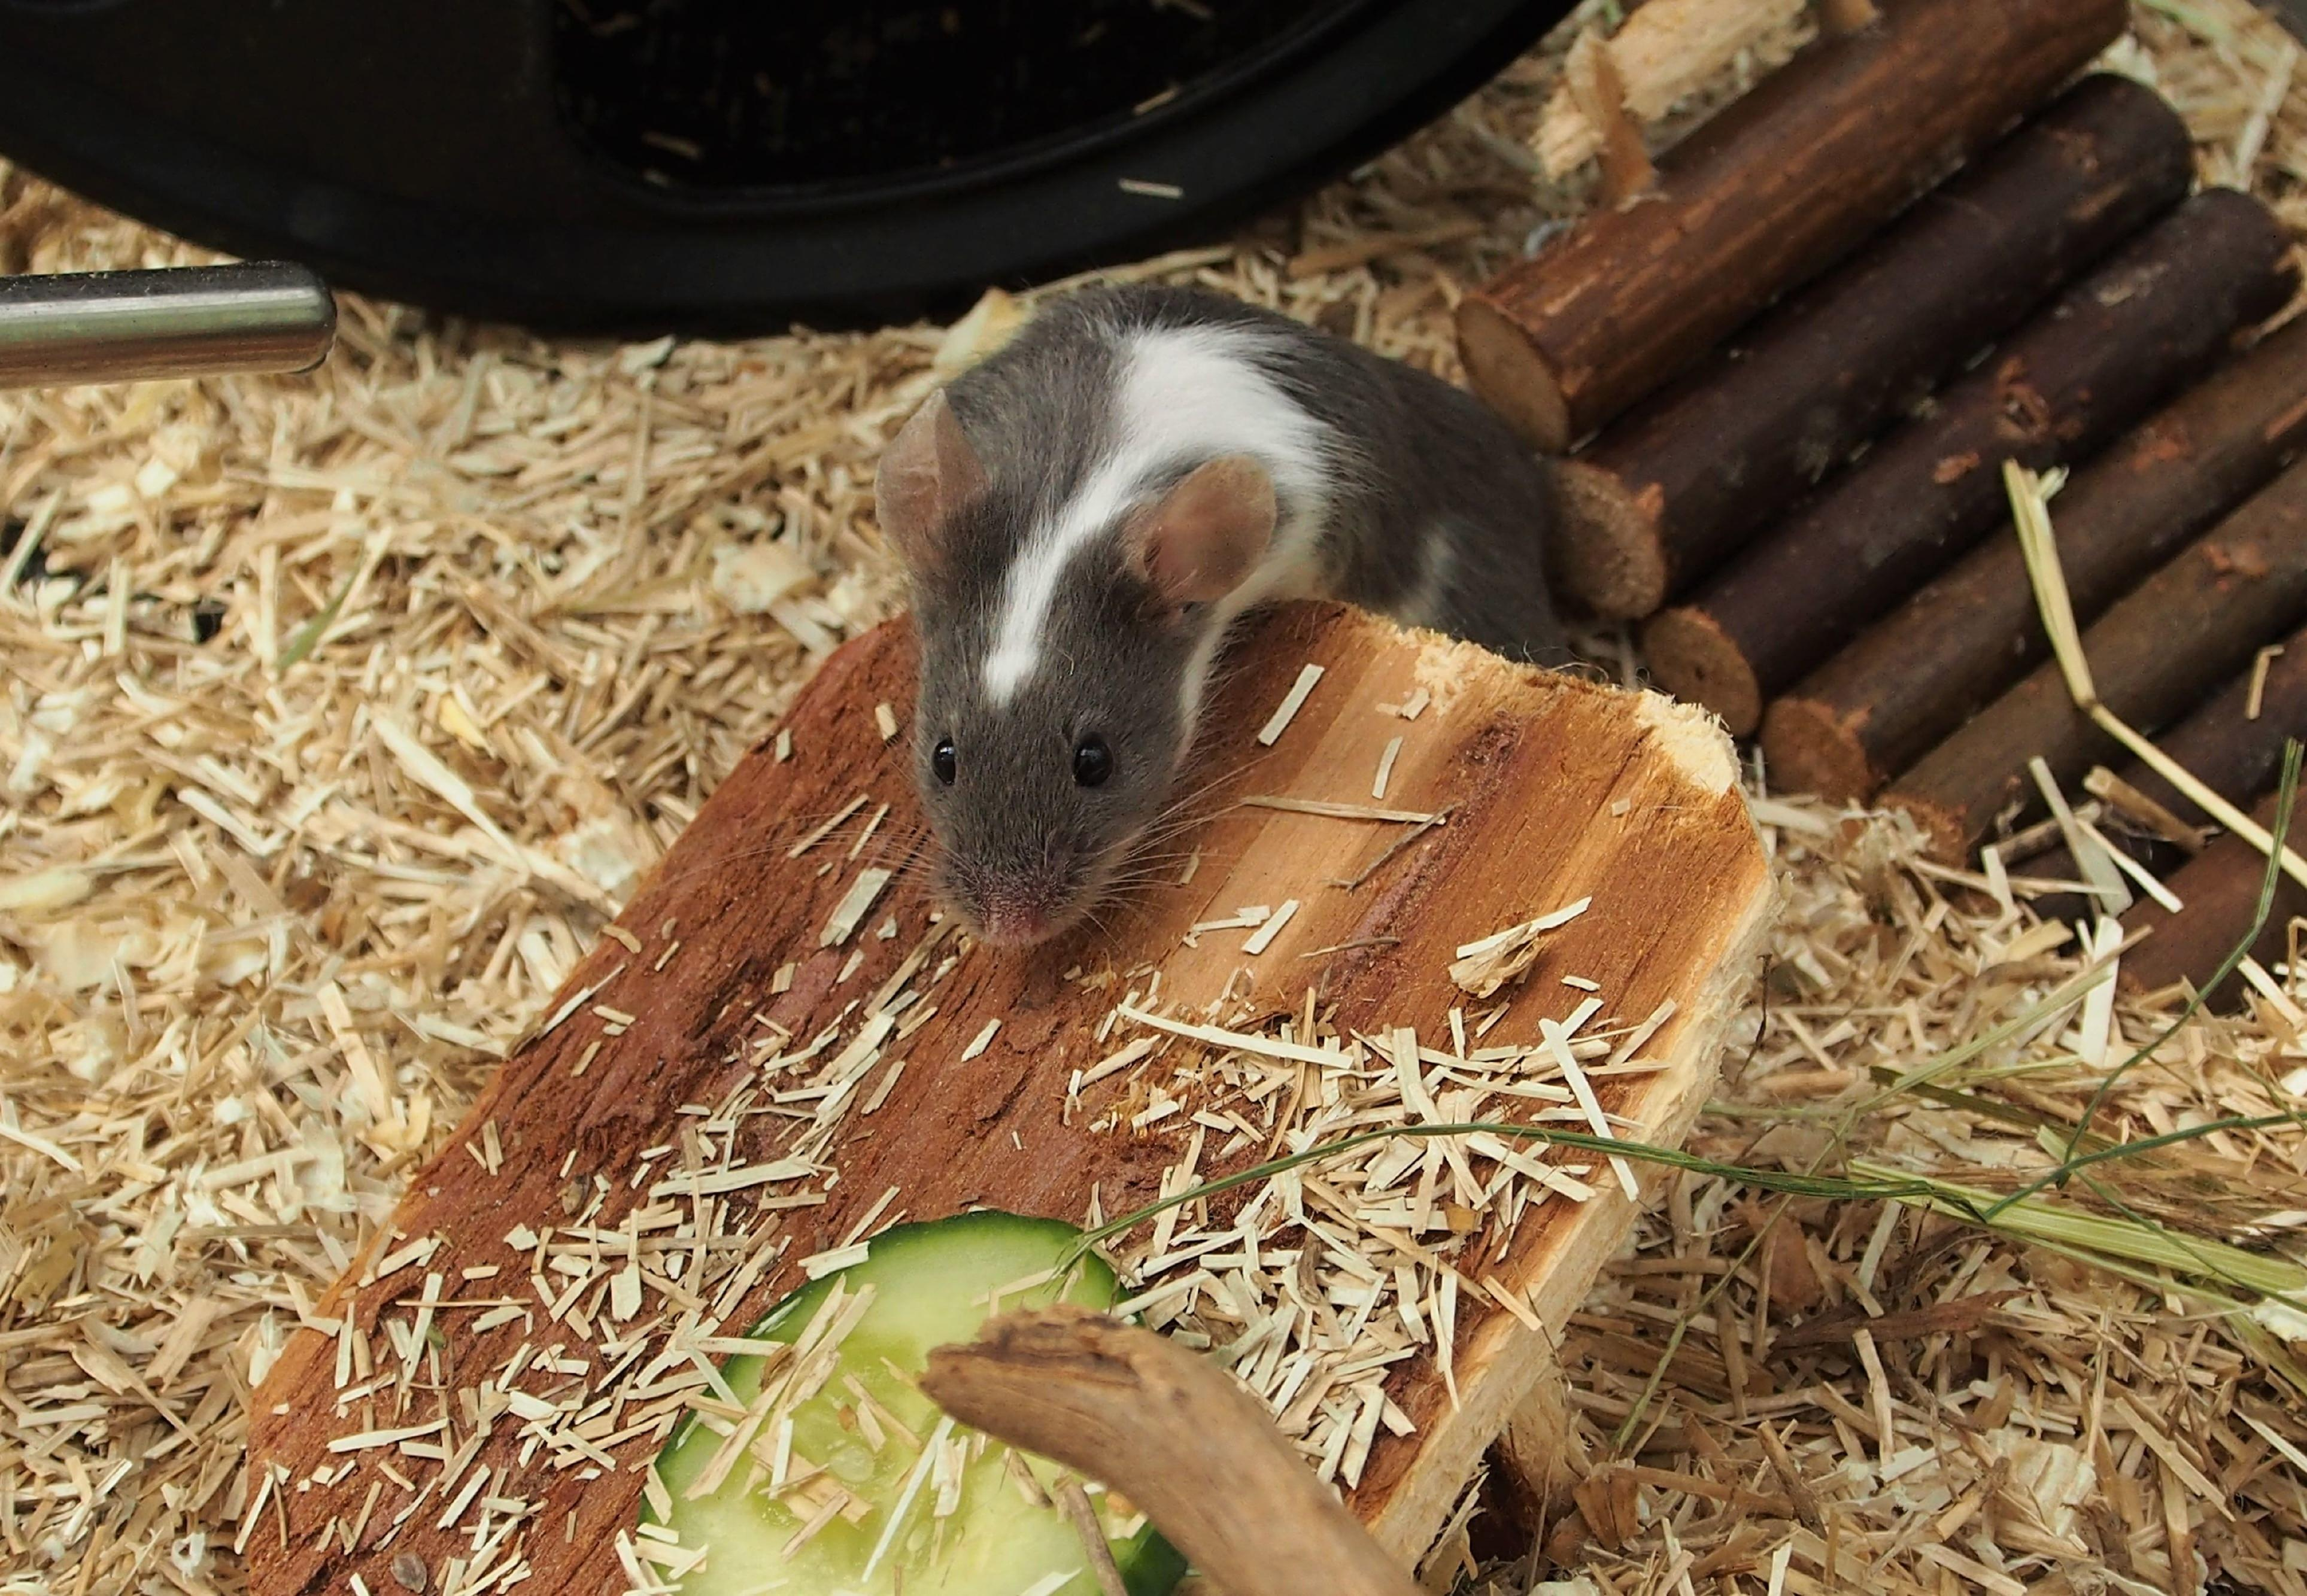 Best design for a mice habitat